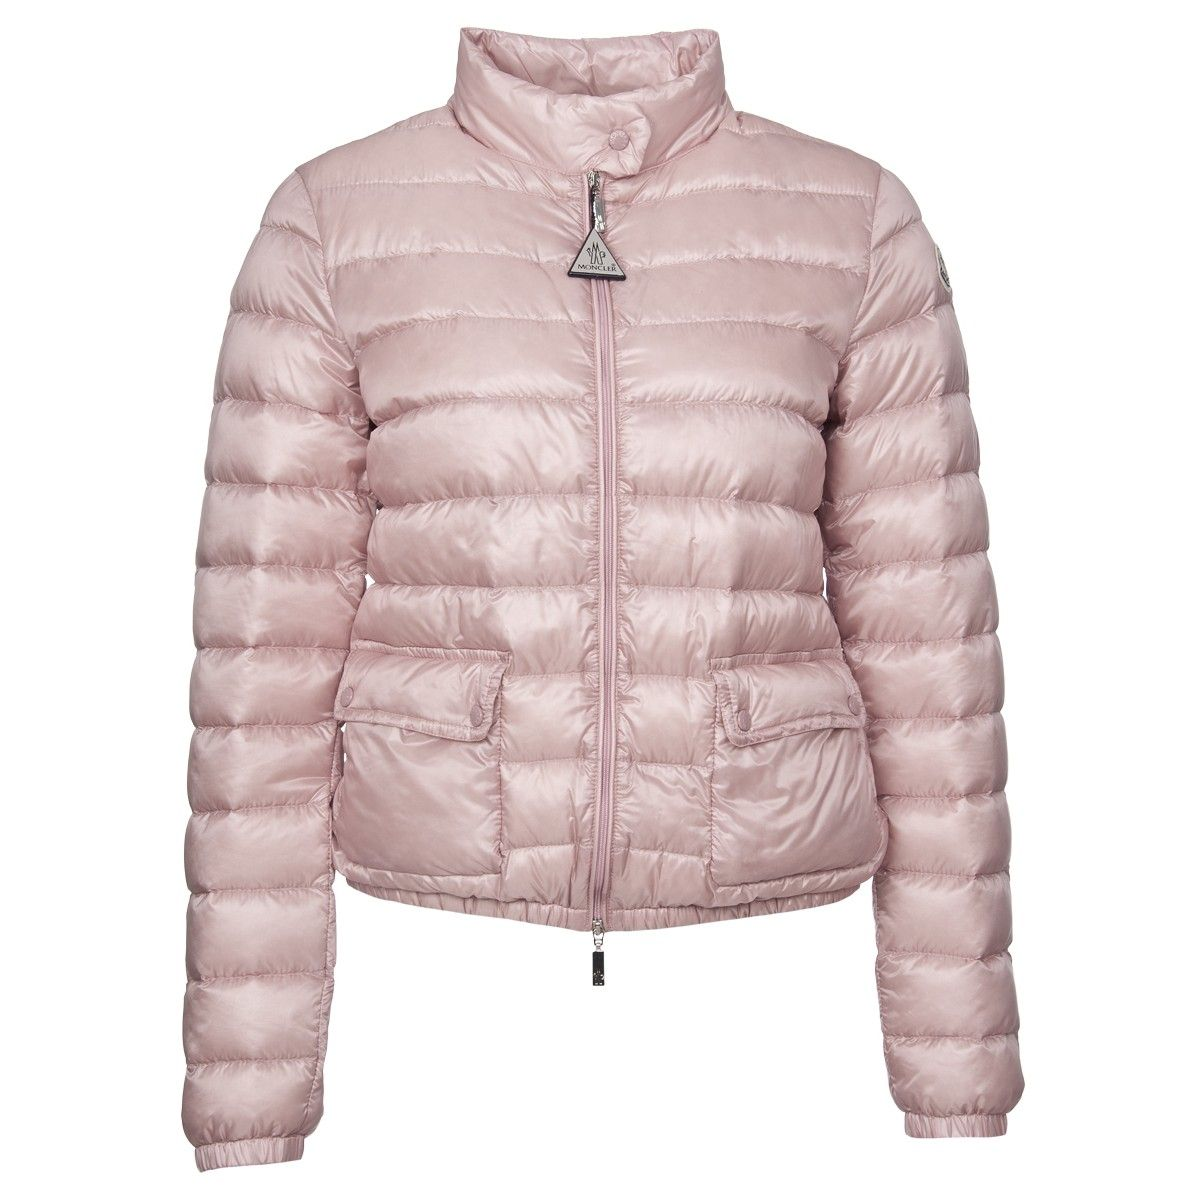 Leichtdaunenjacke LANS in zartem Rosé | Winterjacken, Jacken